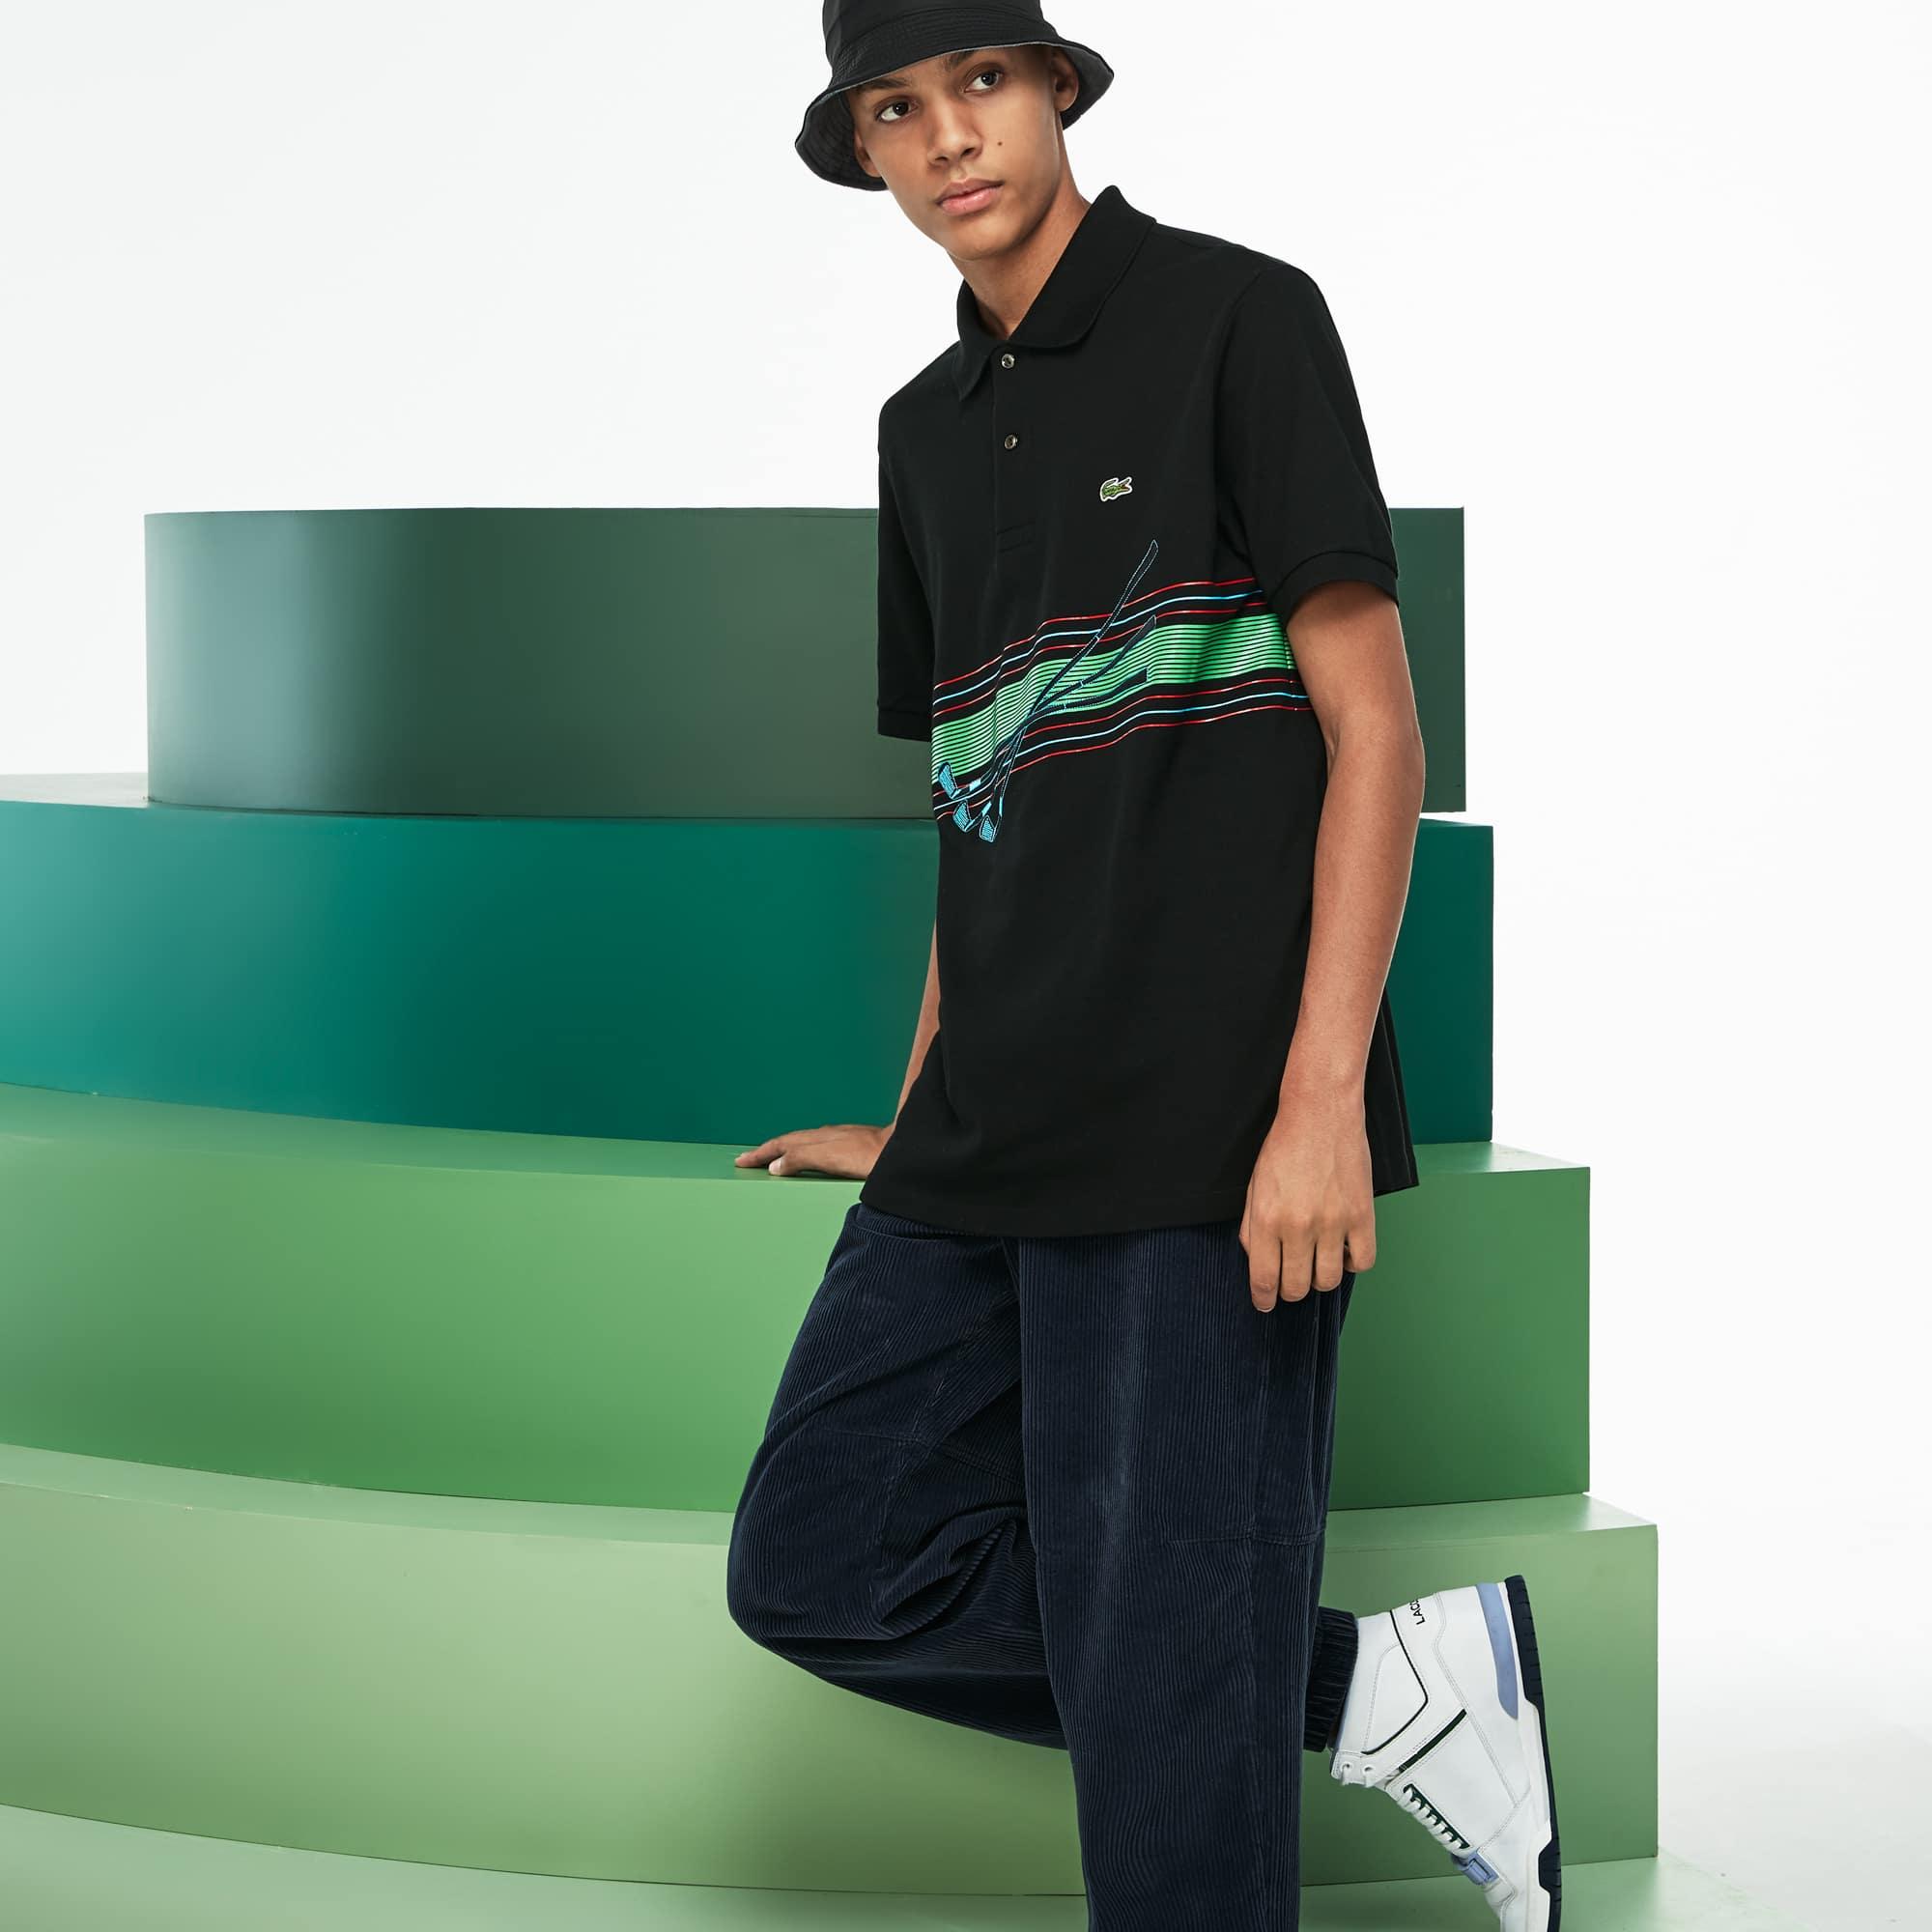 Men's Lacoste Fashion Show Embroidered Cotton Piqué Polo